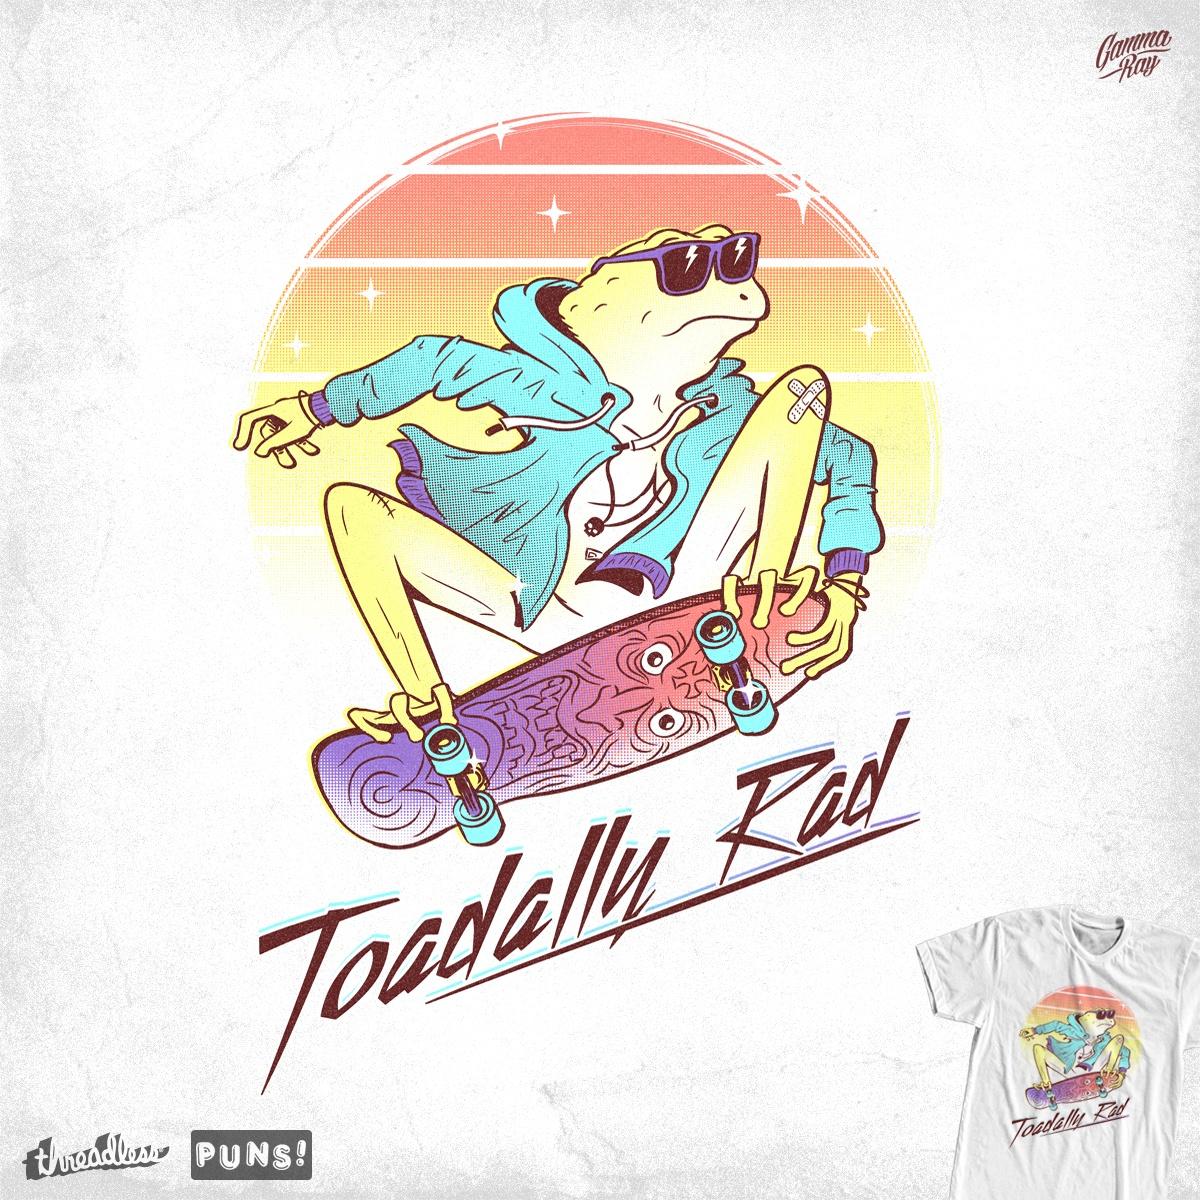 Toadally Rad by Gamma-Ray on Threadless